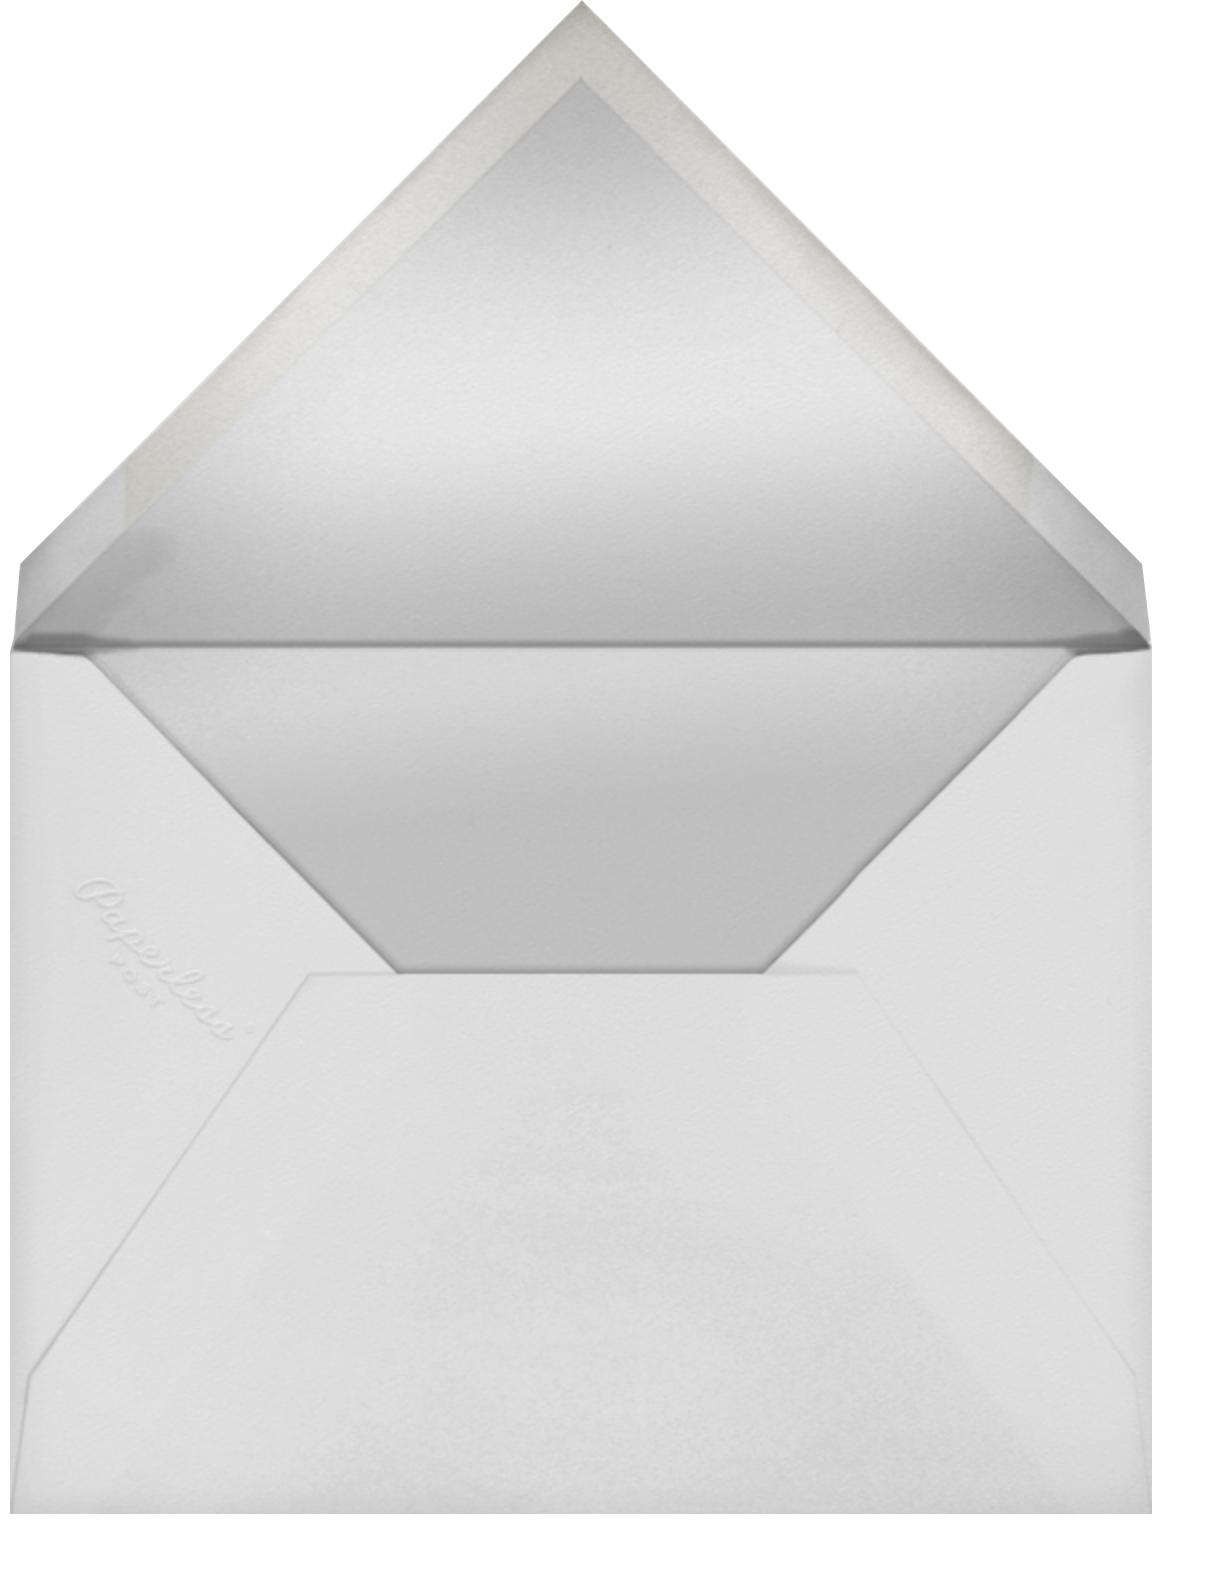 Rose Floral Ikat (Menu) - Navy - Oscar de la Renta - Menus and programs - envelope back